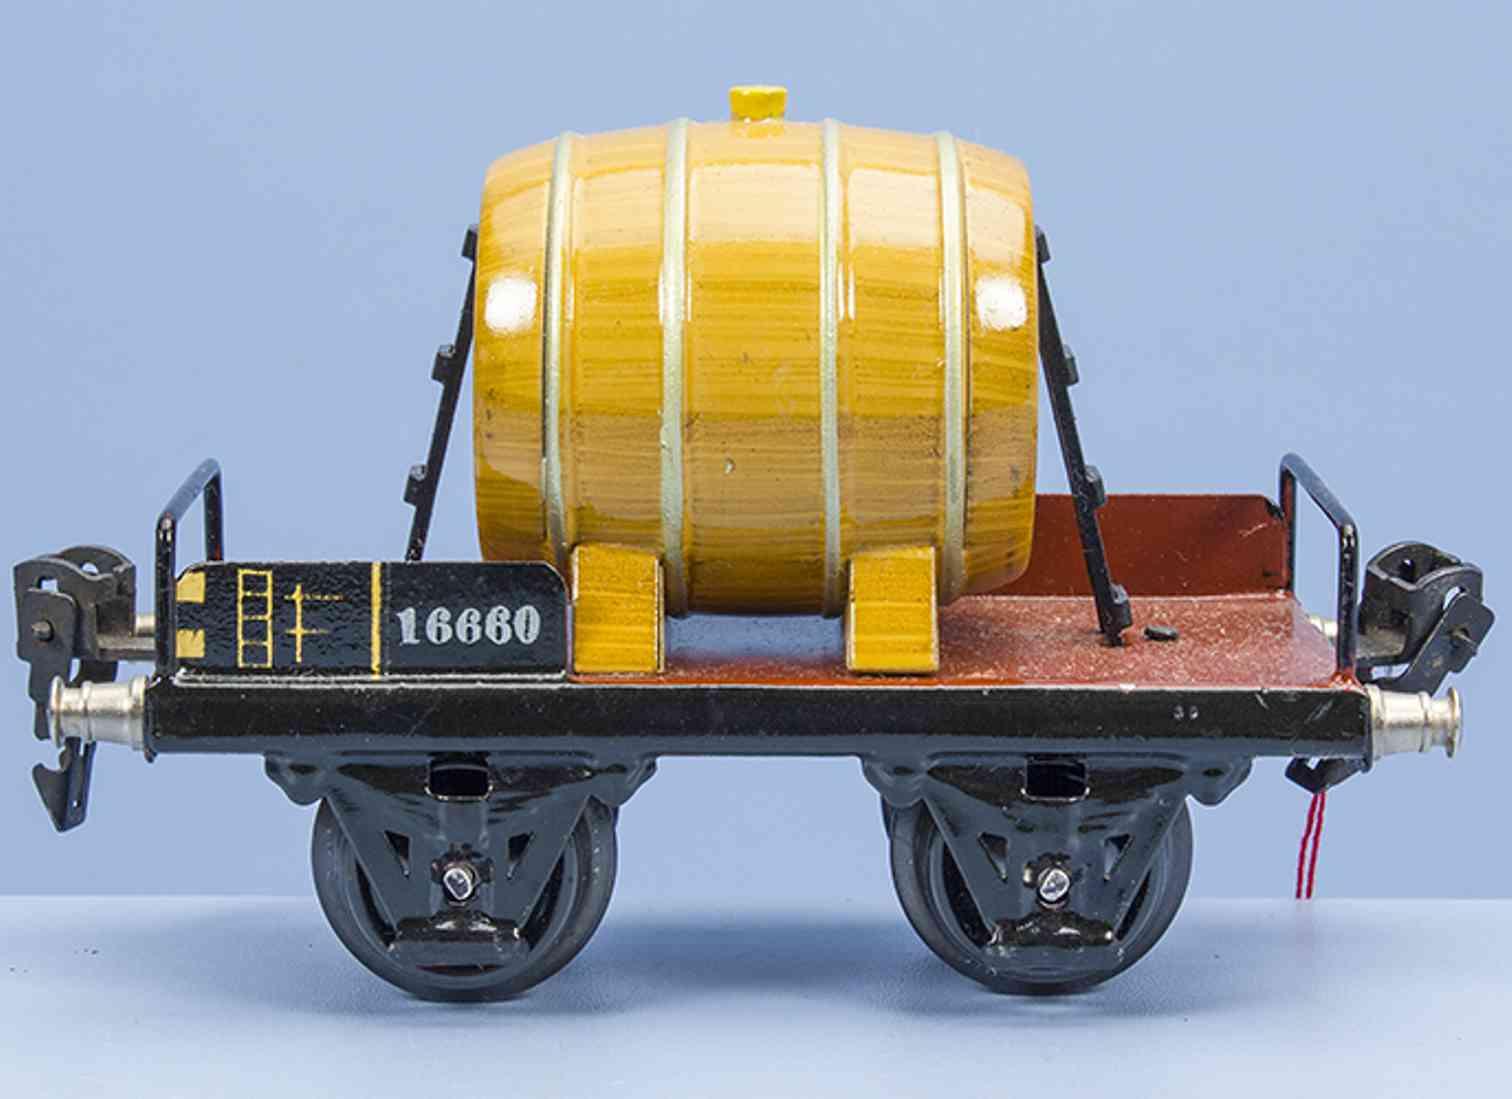 marklin 1666 railway toy barrel car brown with wine barrel gauge 0